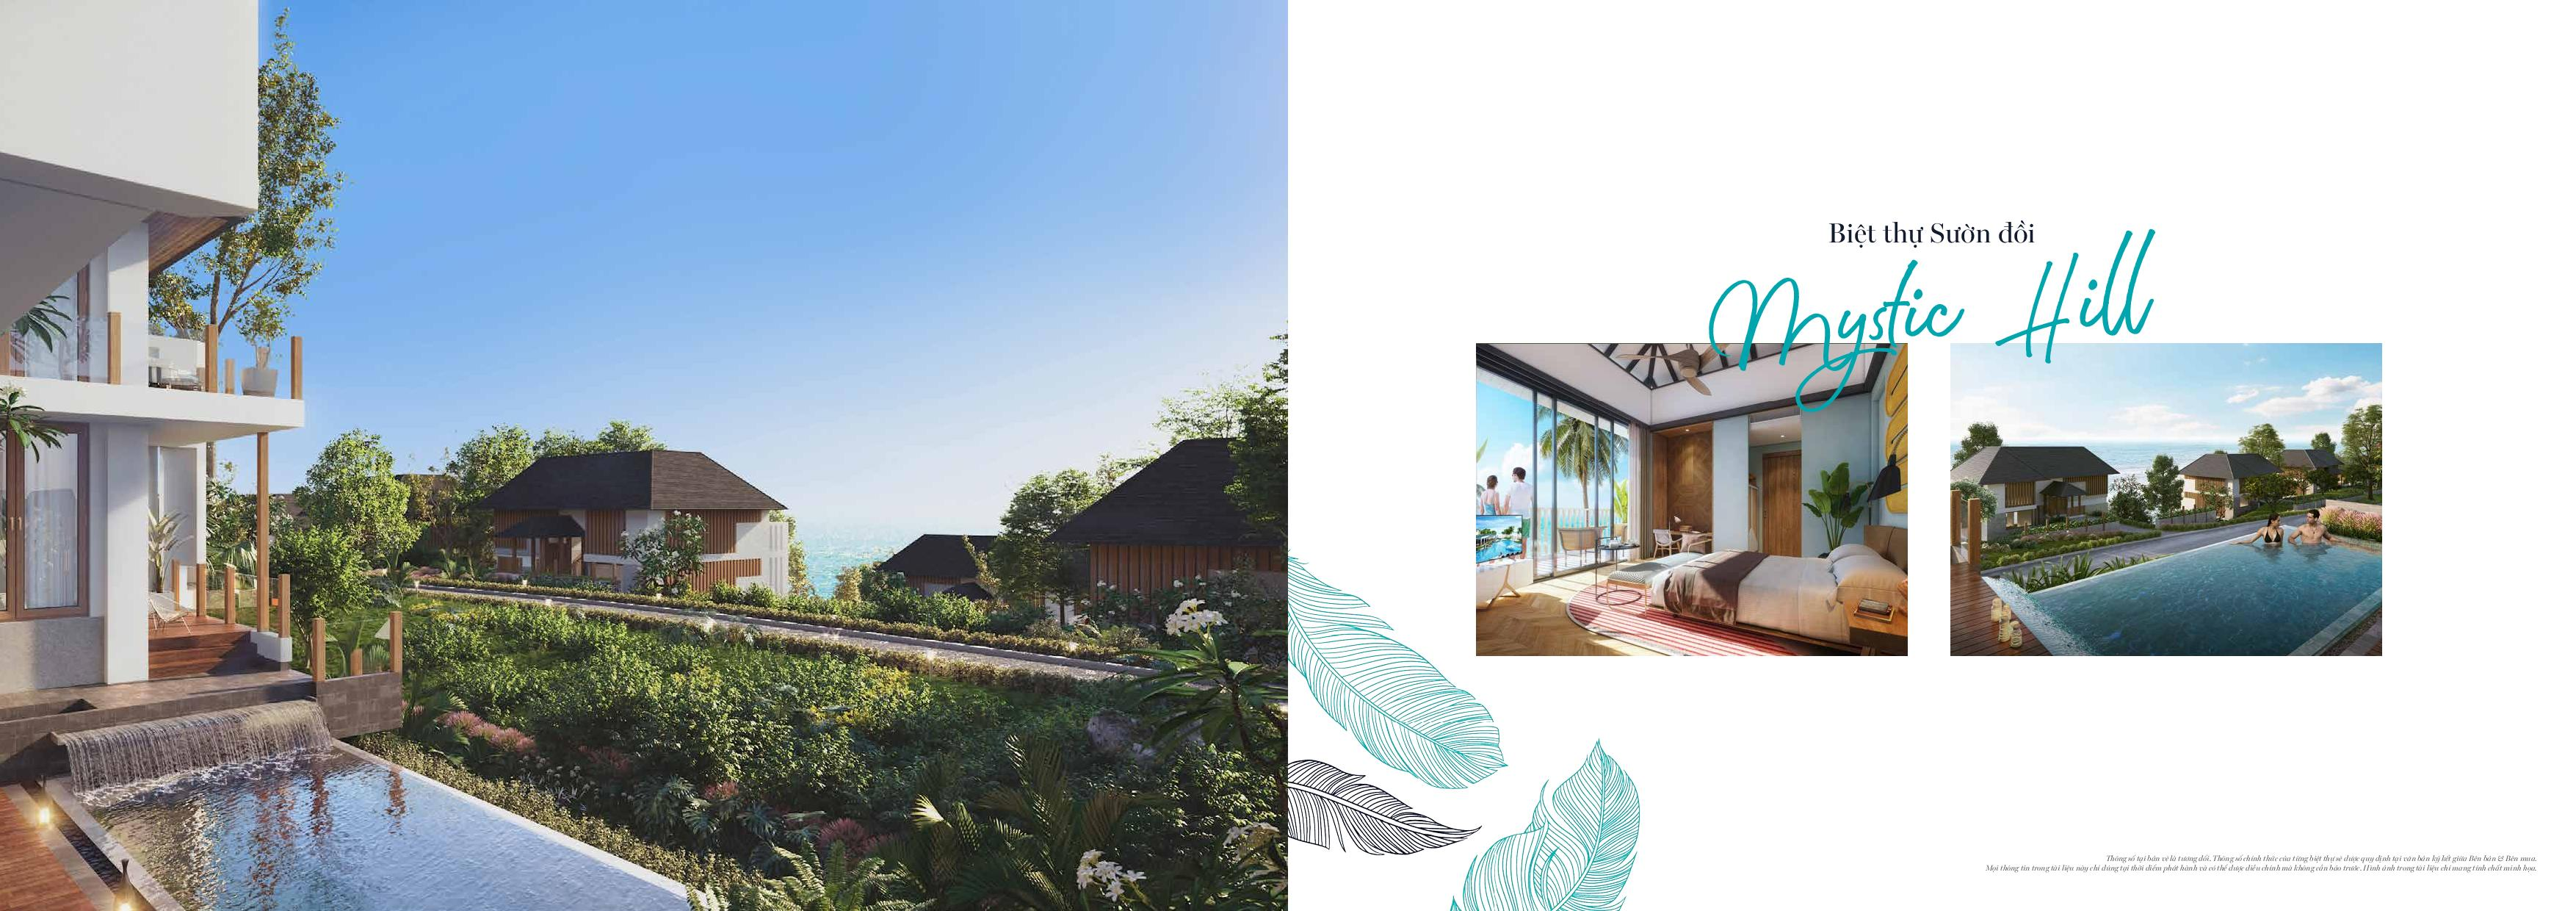 biet thu suon doi sun premier village the eden bay phu quoc